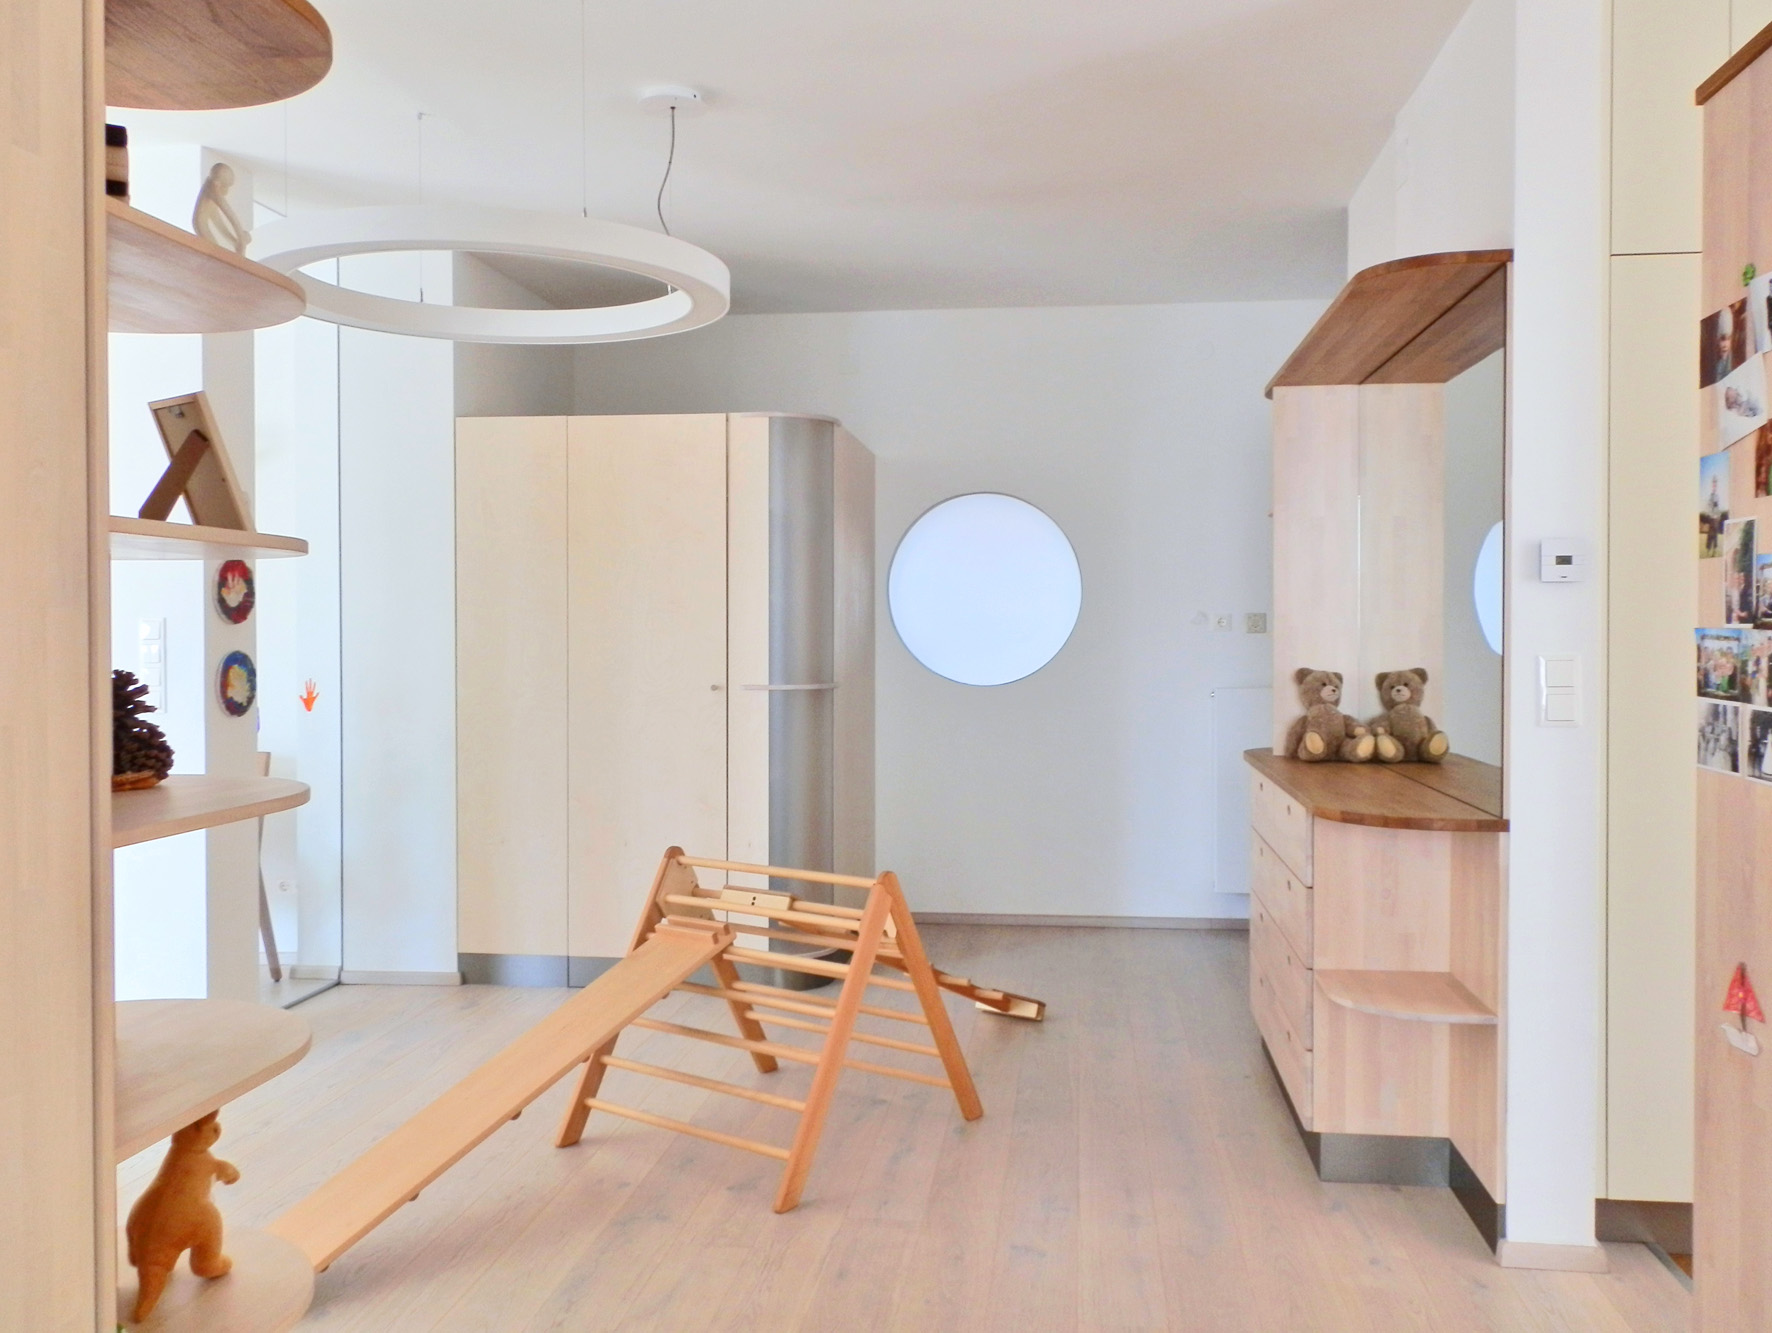 feng shui praxis belichtung einer fensterlosen diele everyday feng shui. Black Bedroom Furniture Sets. Home Design Ideas